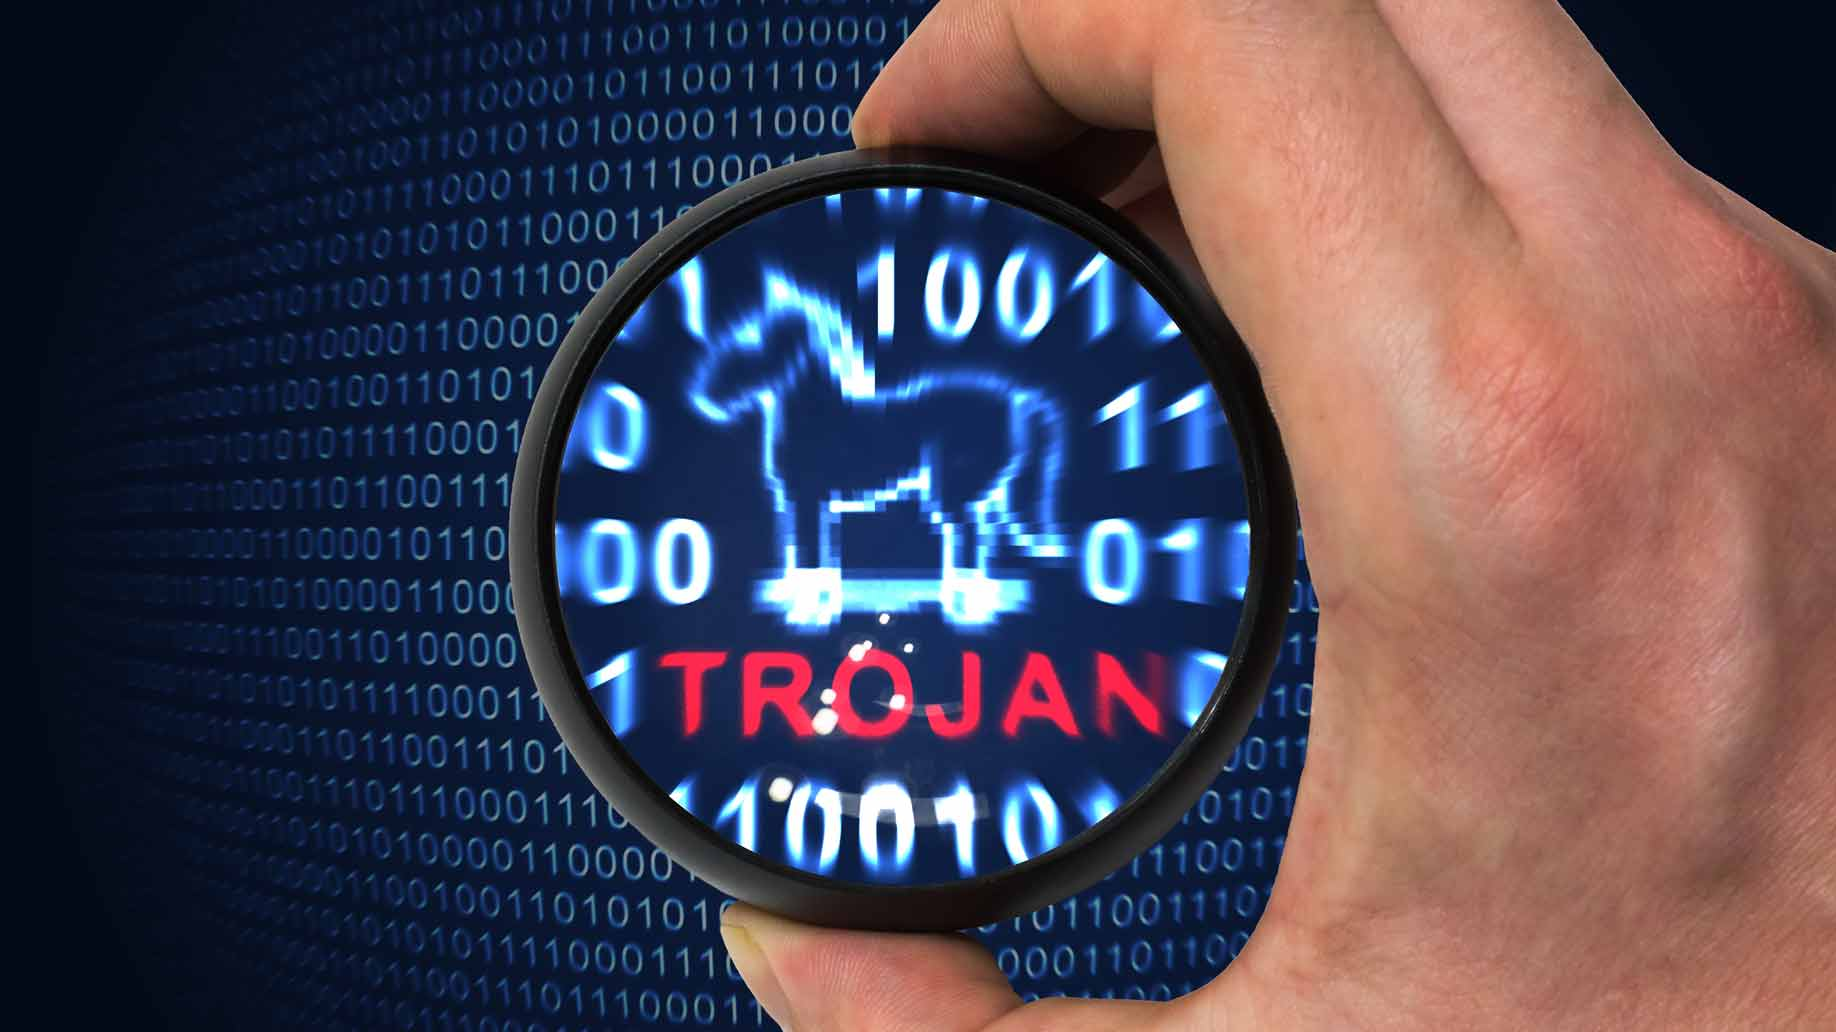 Remove TrojanProxy:JS/Paco.A